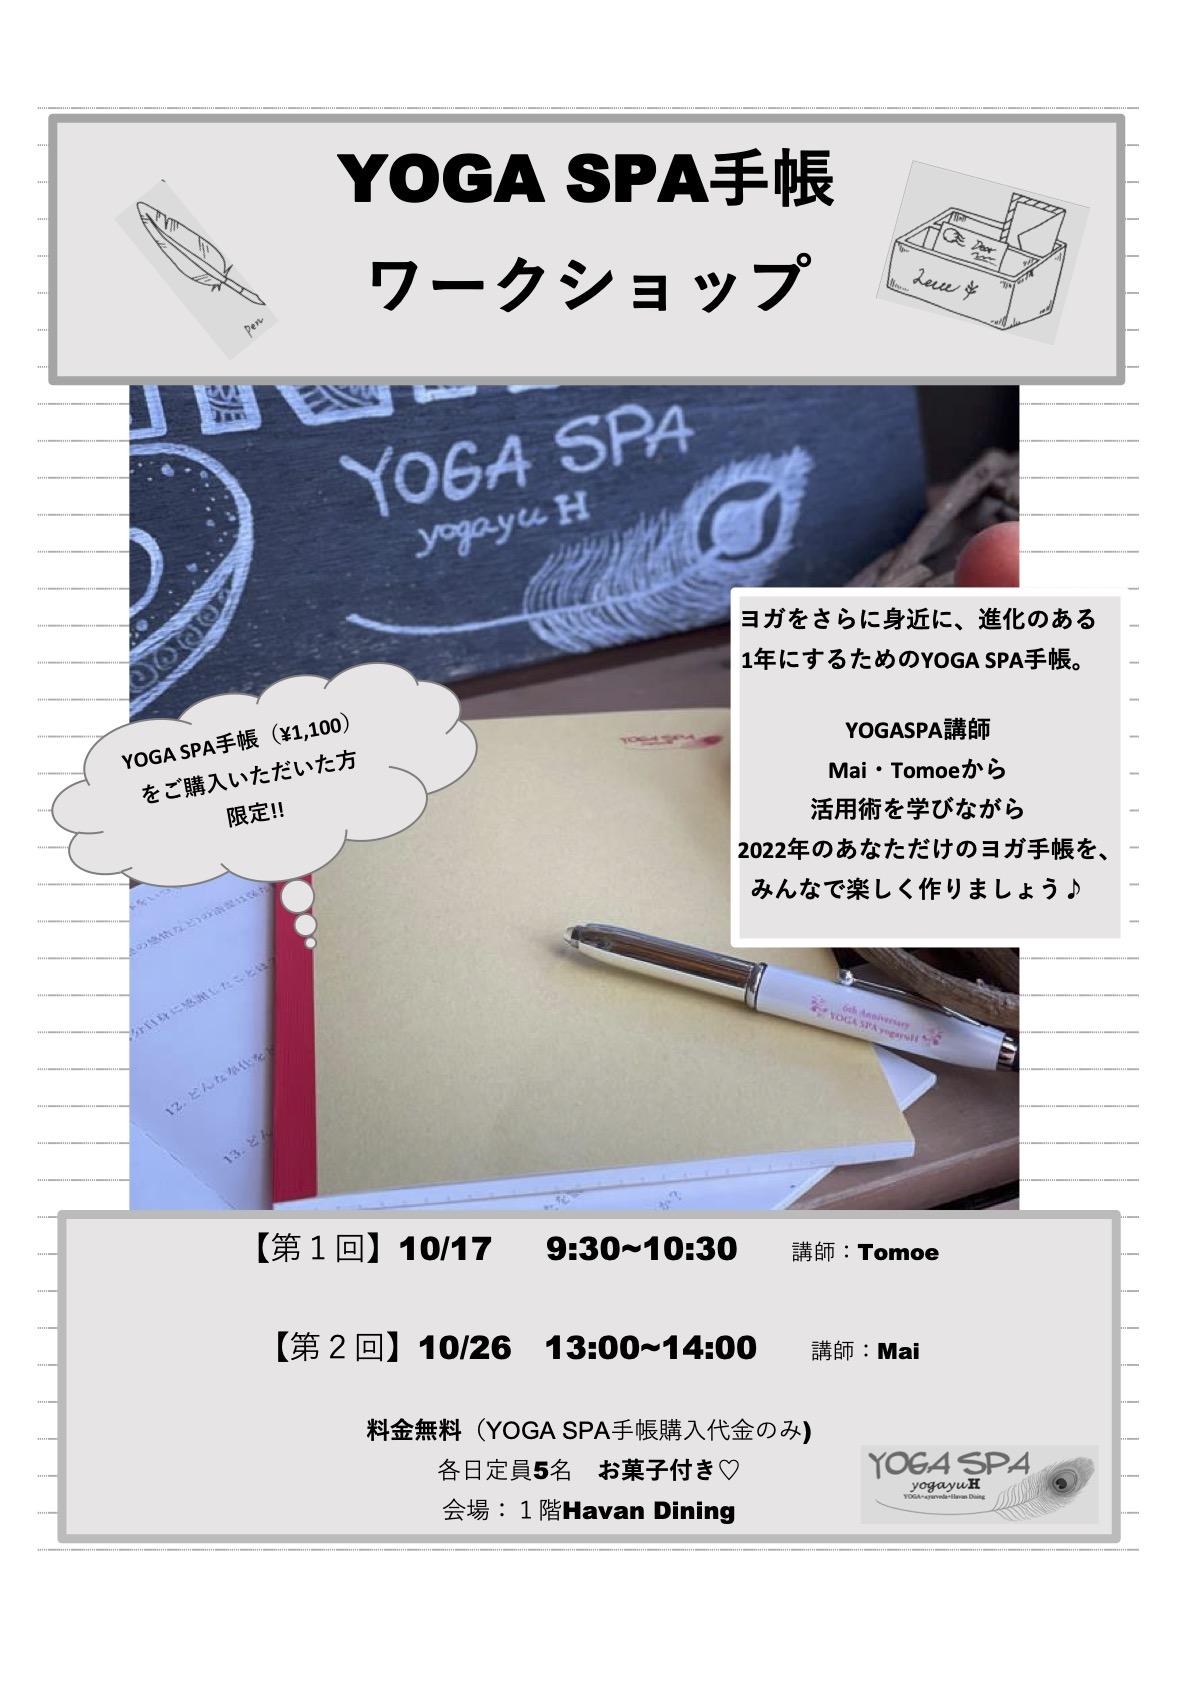 YOGA SPA手帳ワークショップ